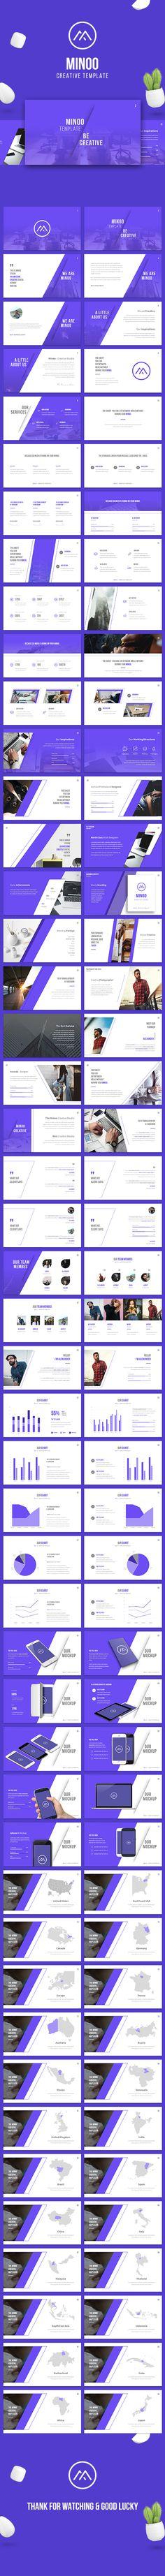 Minoo - Creative Powerpoint Template